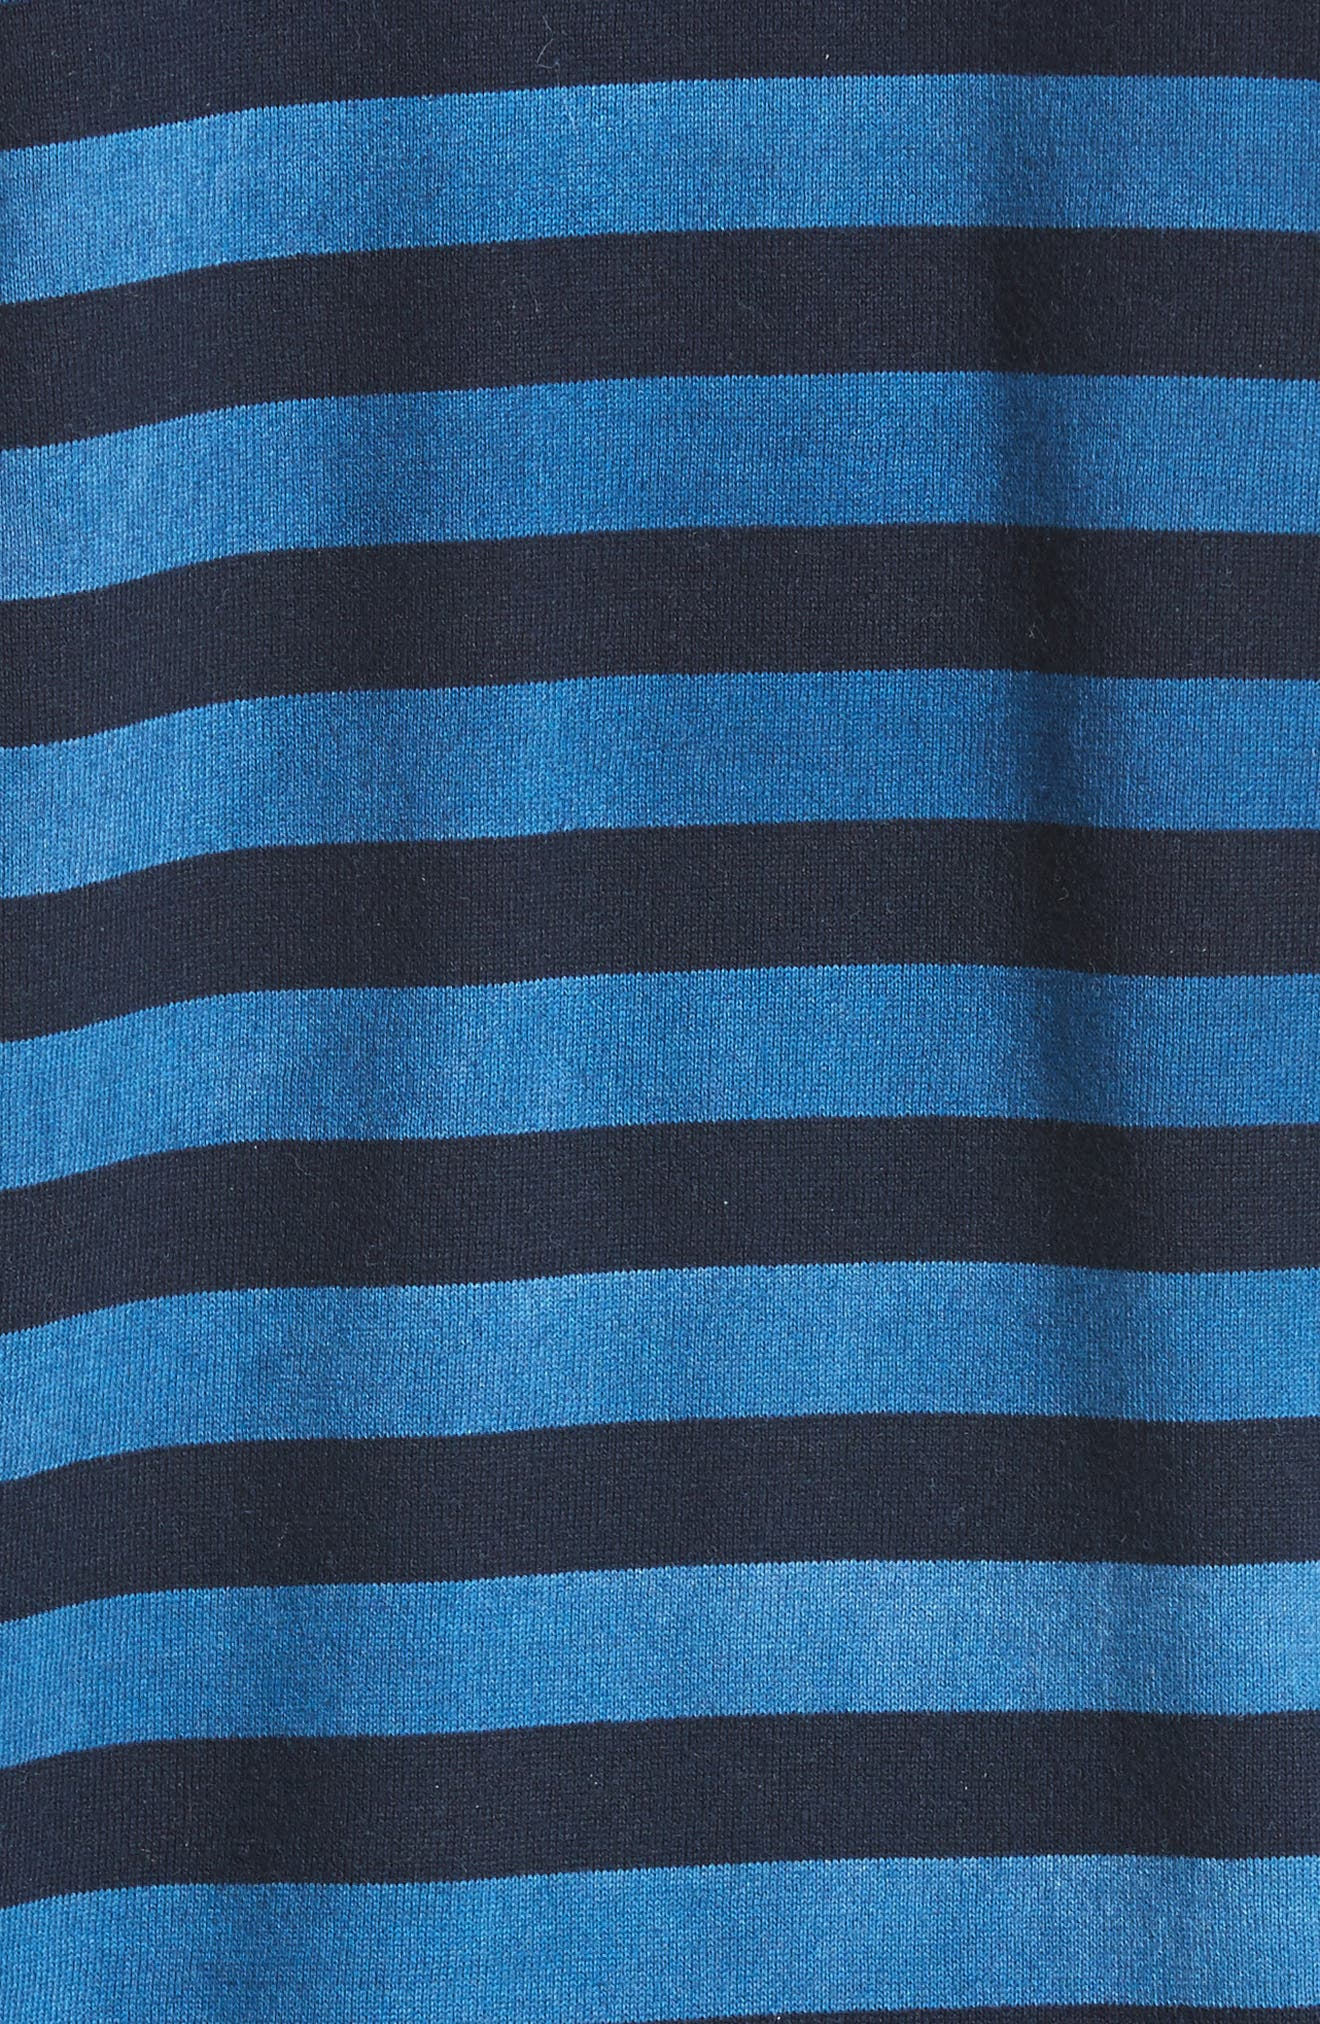 Alternate Image 3  - Comme des Garçons Border Stripe Tee